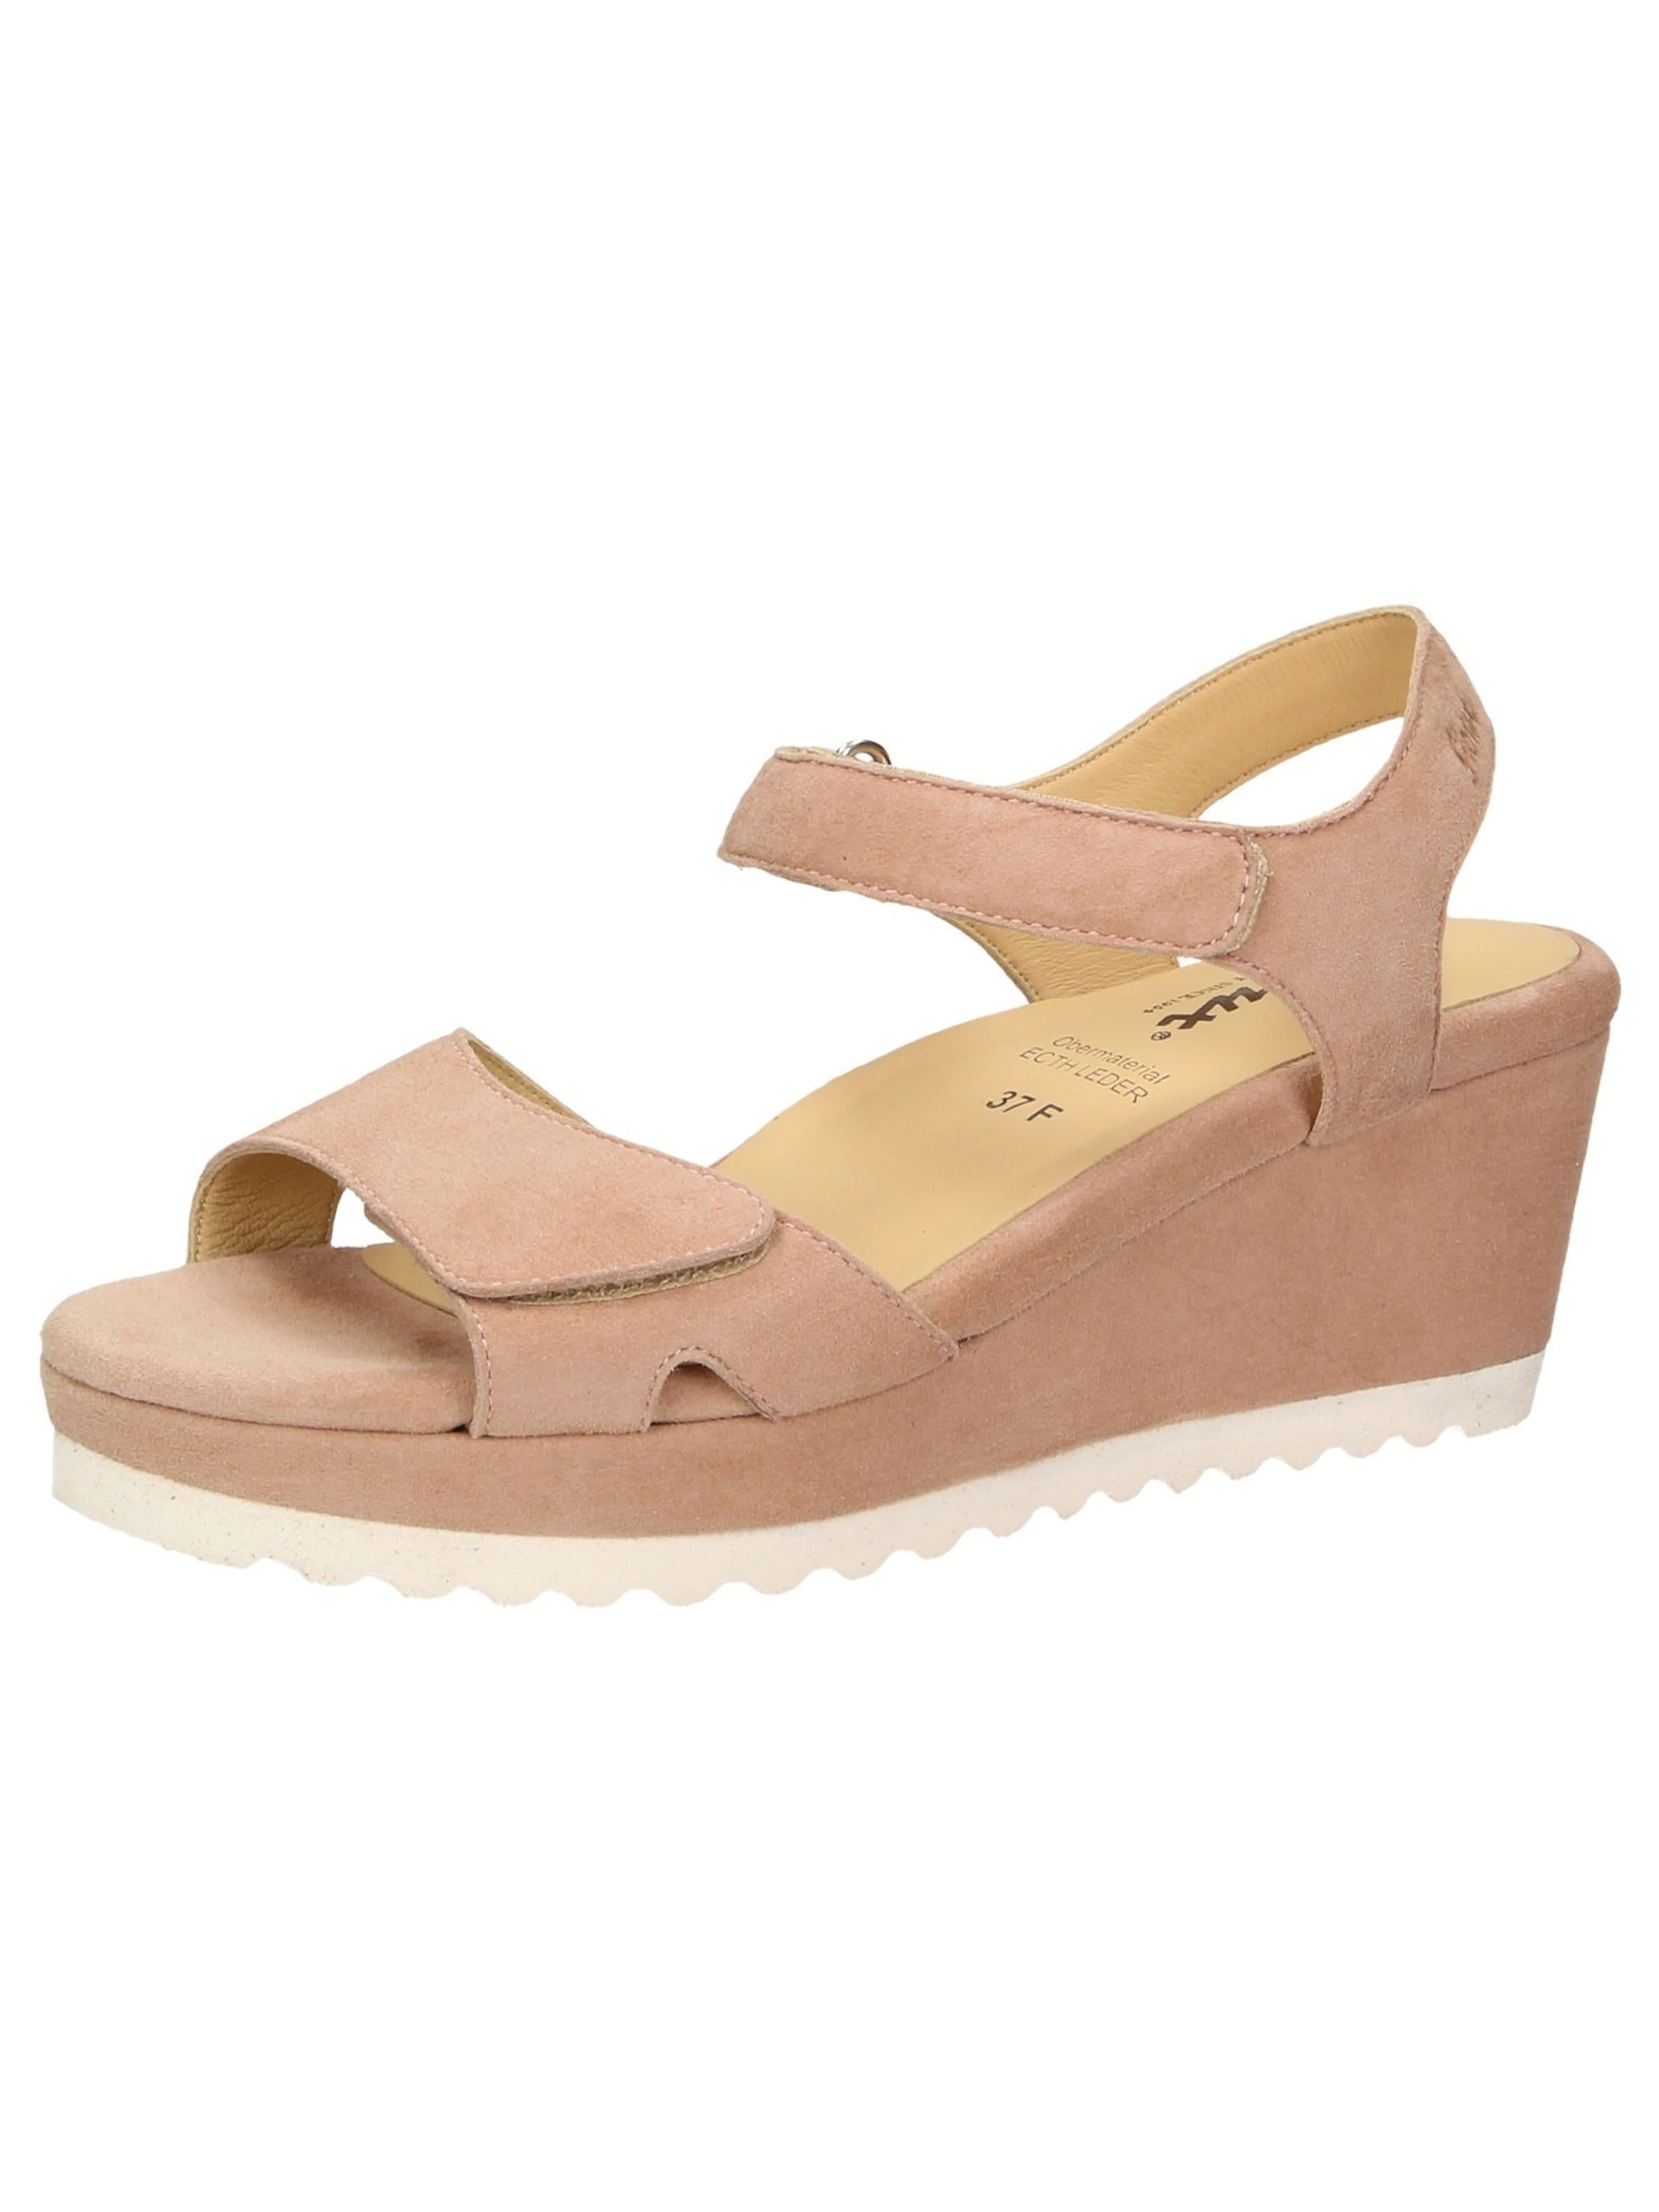 Haltbare Haltbare Haltbare Mode billige Schuhe SIOUX | Sandale 'Folinera' Schuhe Gut getragene Schuhe d97ac8